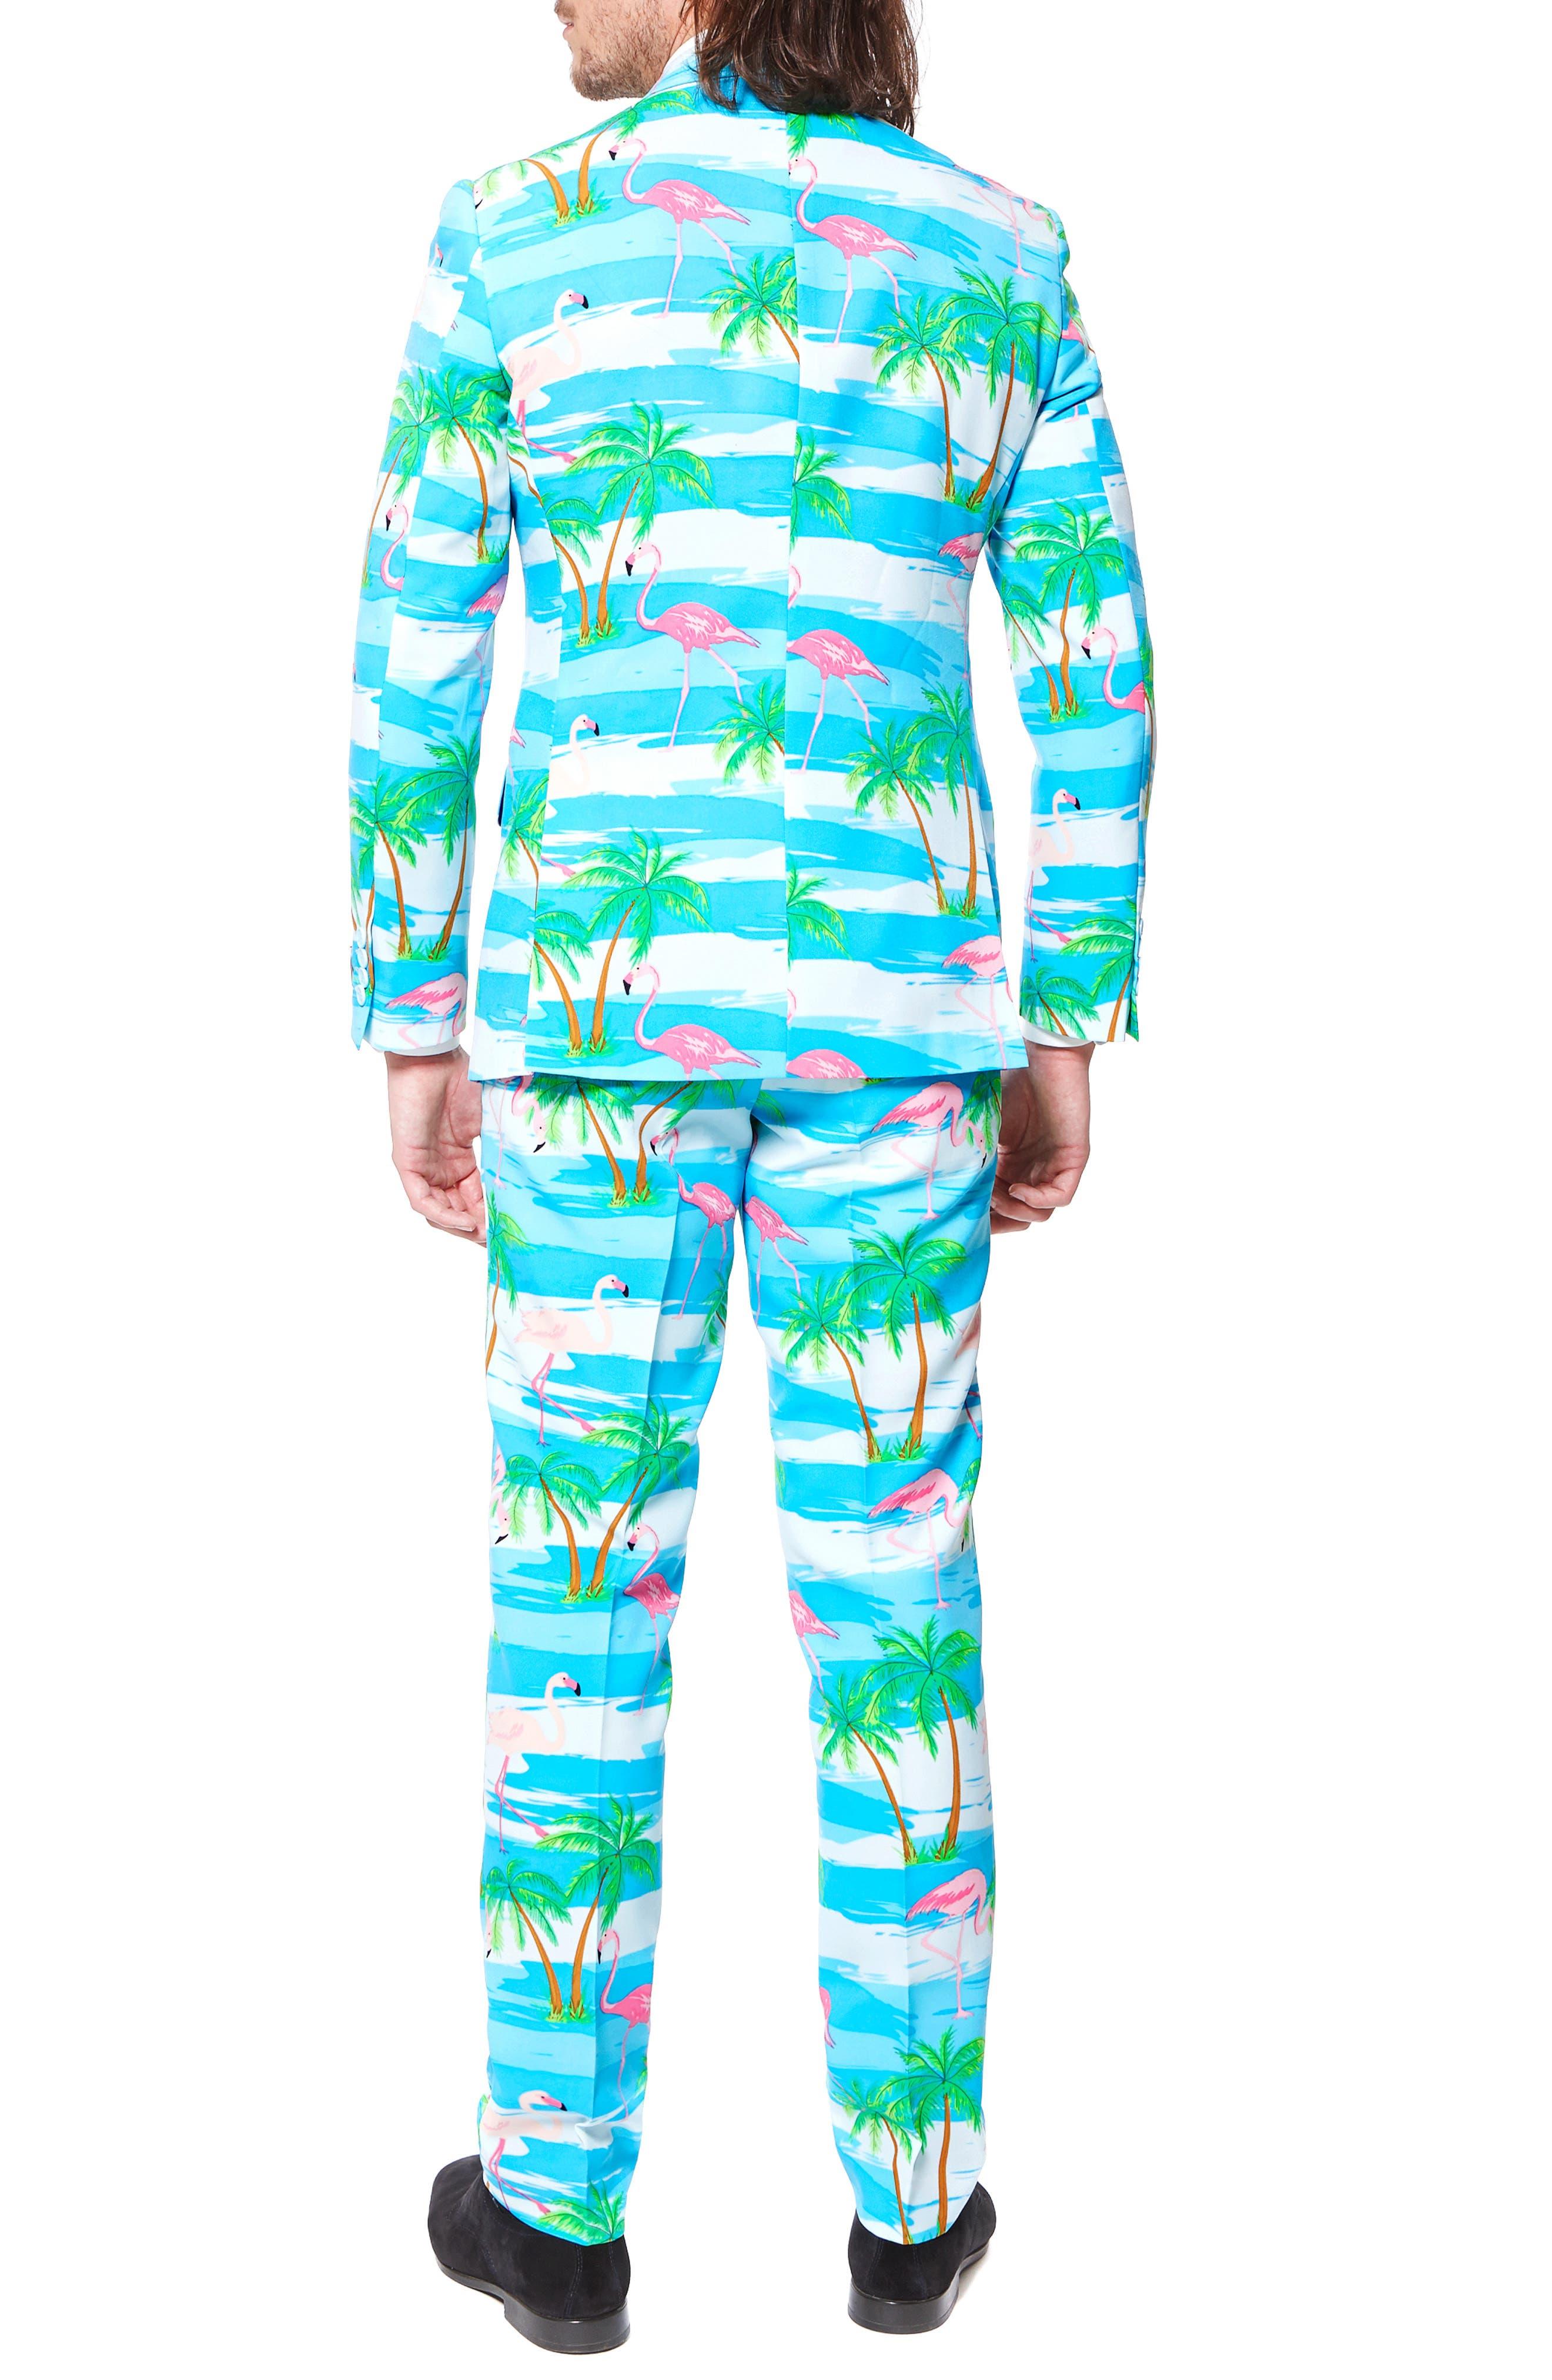 'Flaminguy' Trim Fit Two-Piece Suit with Tie,                             Alternate thumbnail 2, color,                             400